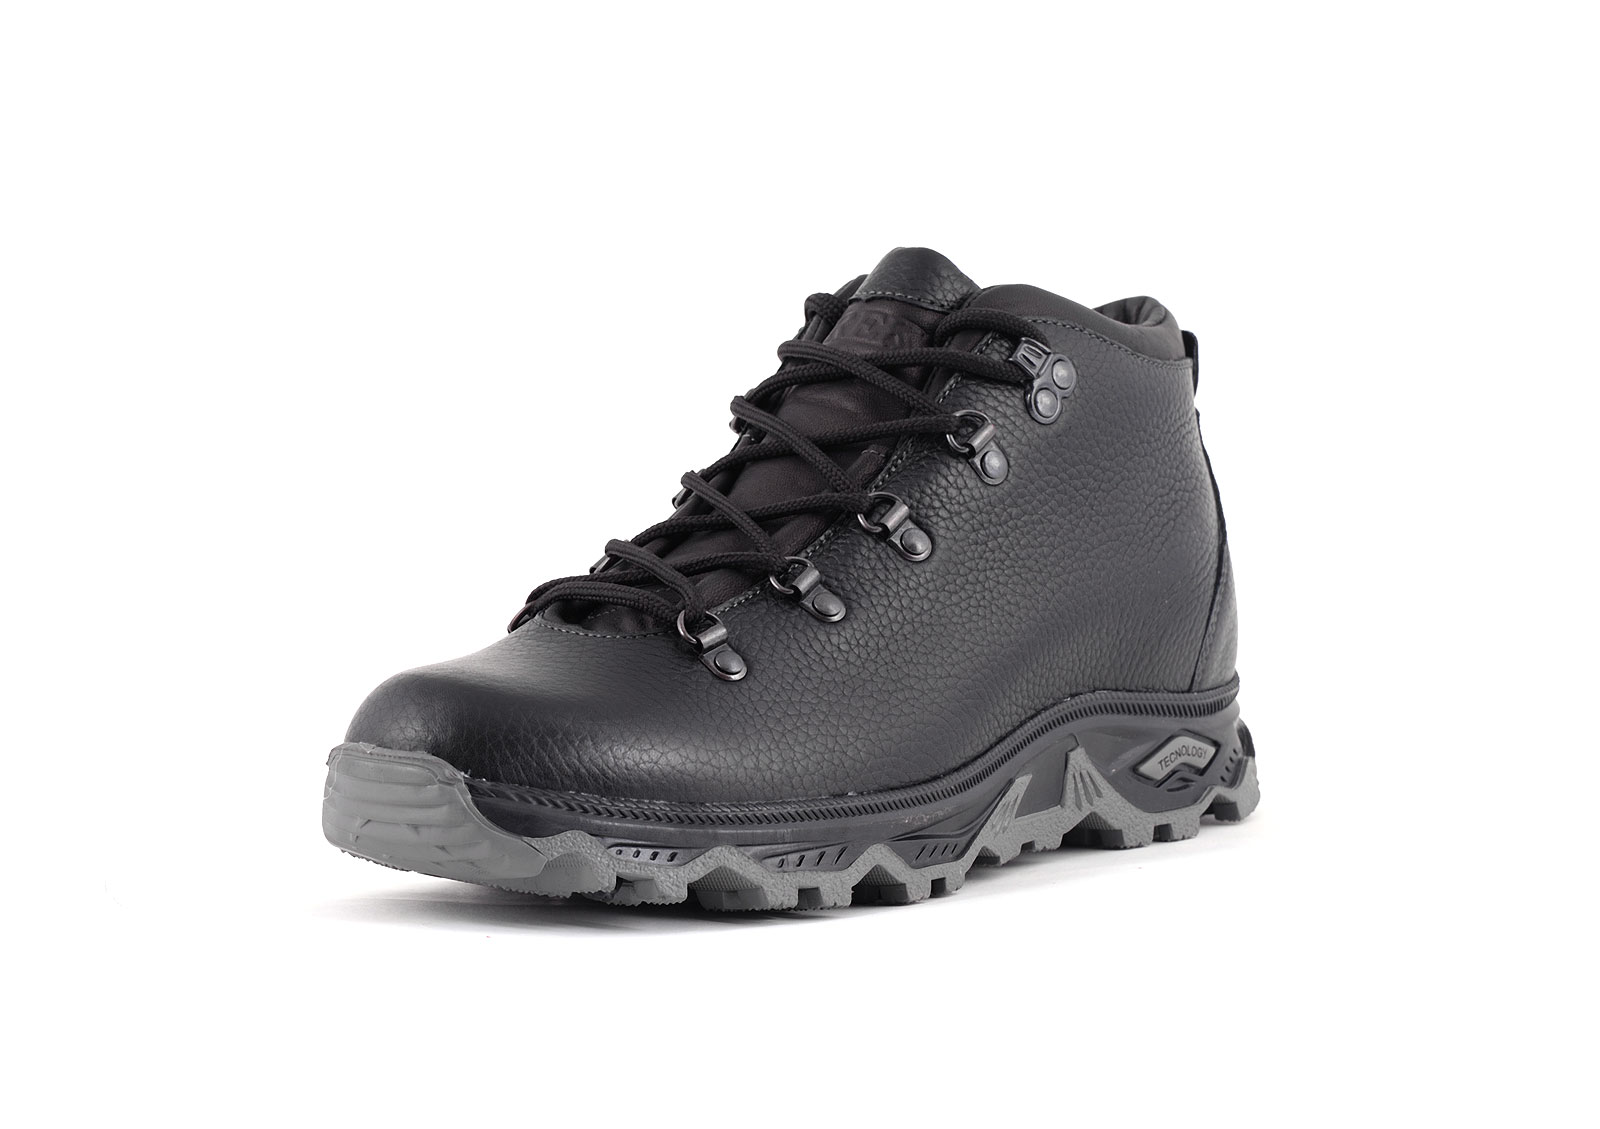 b5342e87b Ботинки TREK Andes1 (капровелюр), производитель Компания